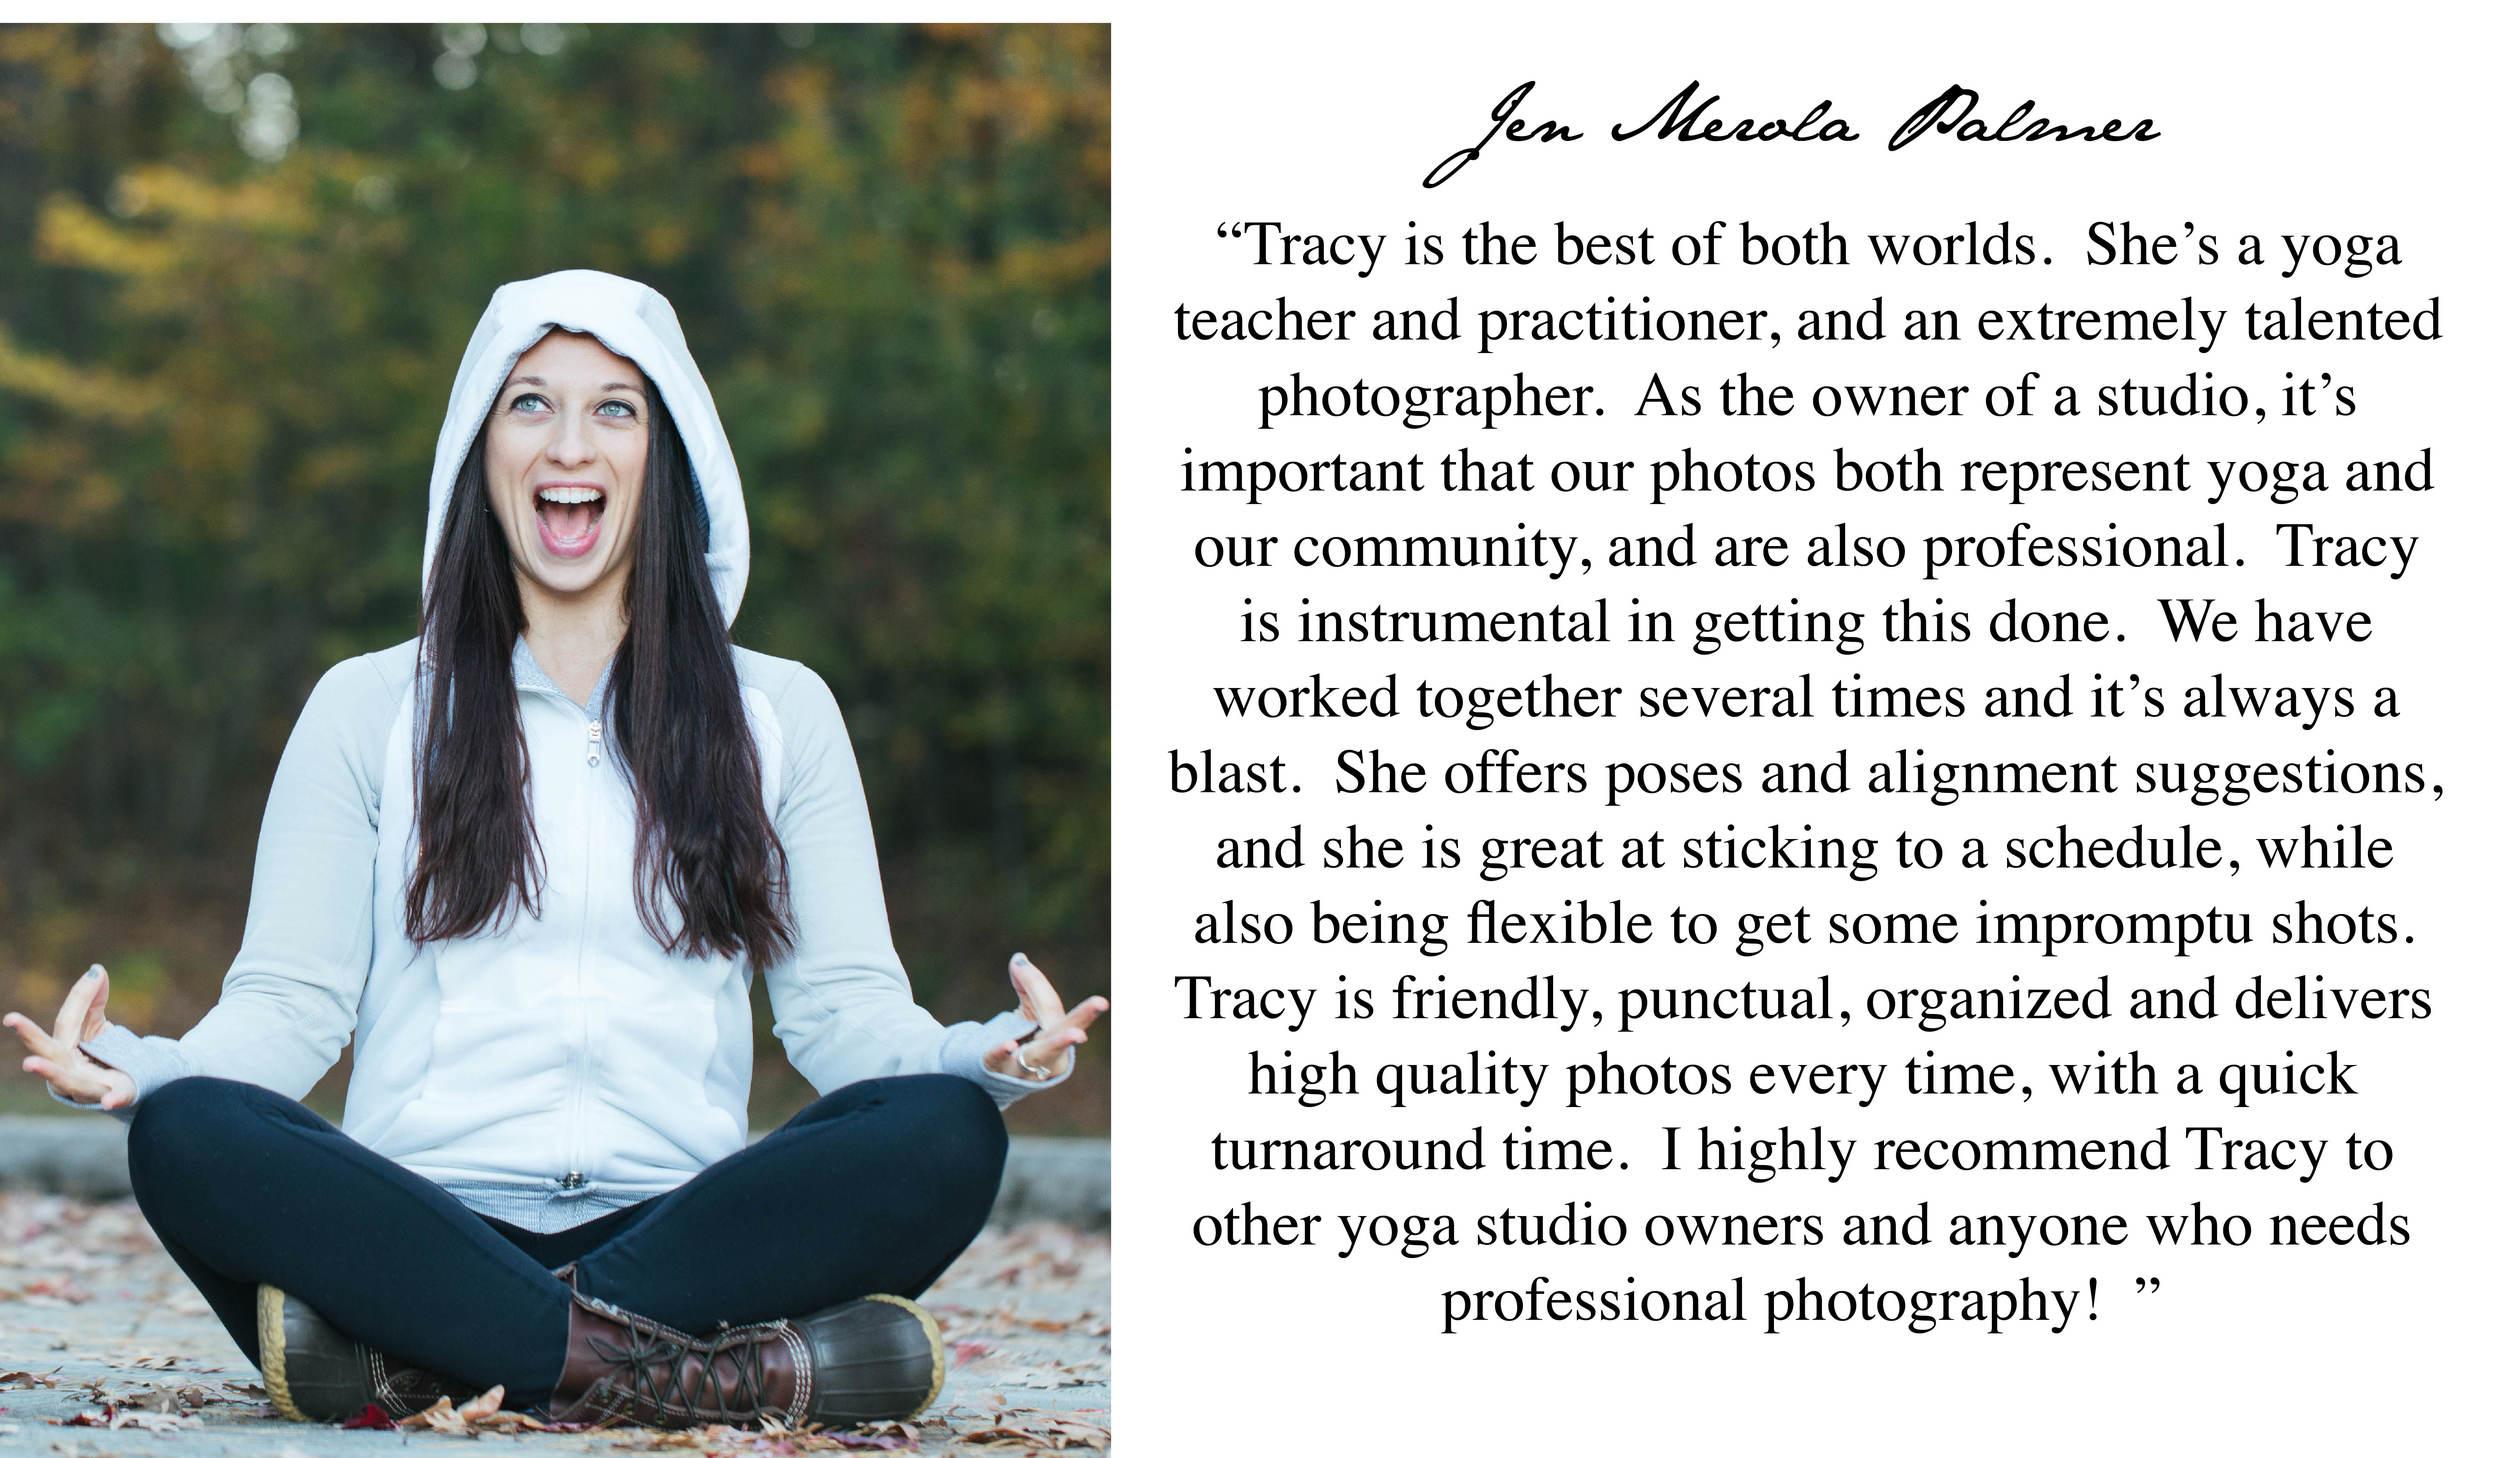 Tracy_Rodriguez_Photography_Review_Yoga_Universal_Power_Yoga_Jen_Merola_Palmer.jpg